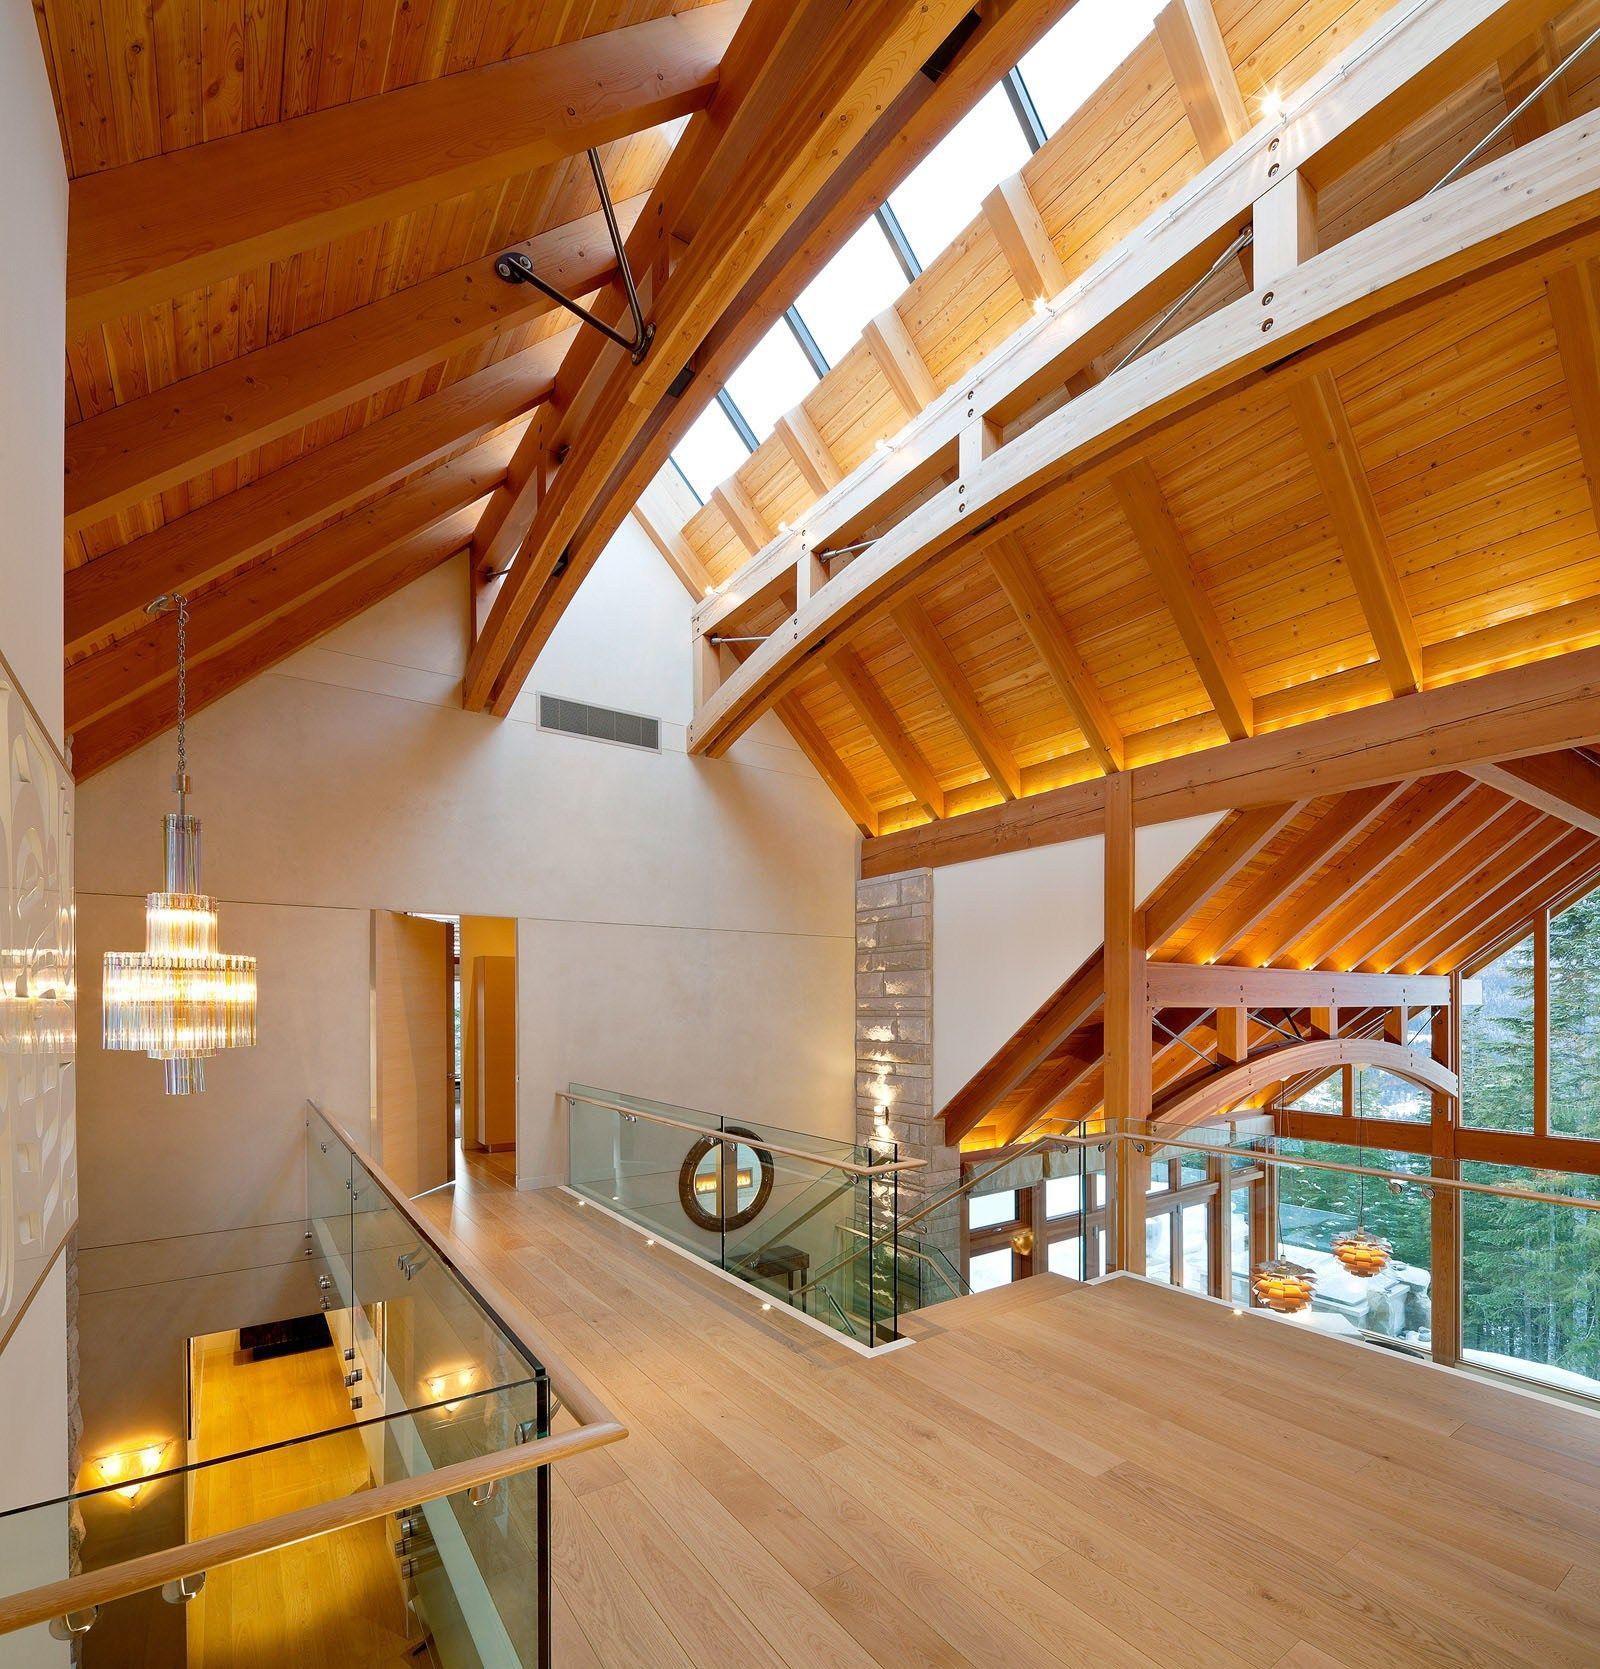 kadenwood timber frame home stunning contemporary timber frame mountain home kadenwood